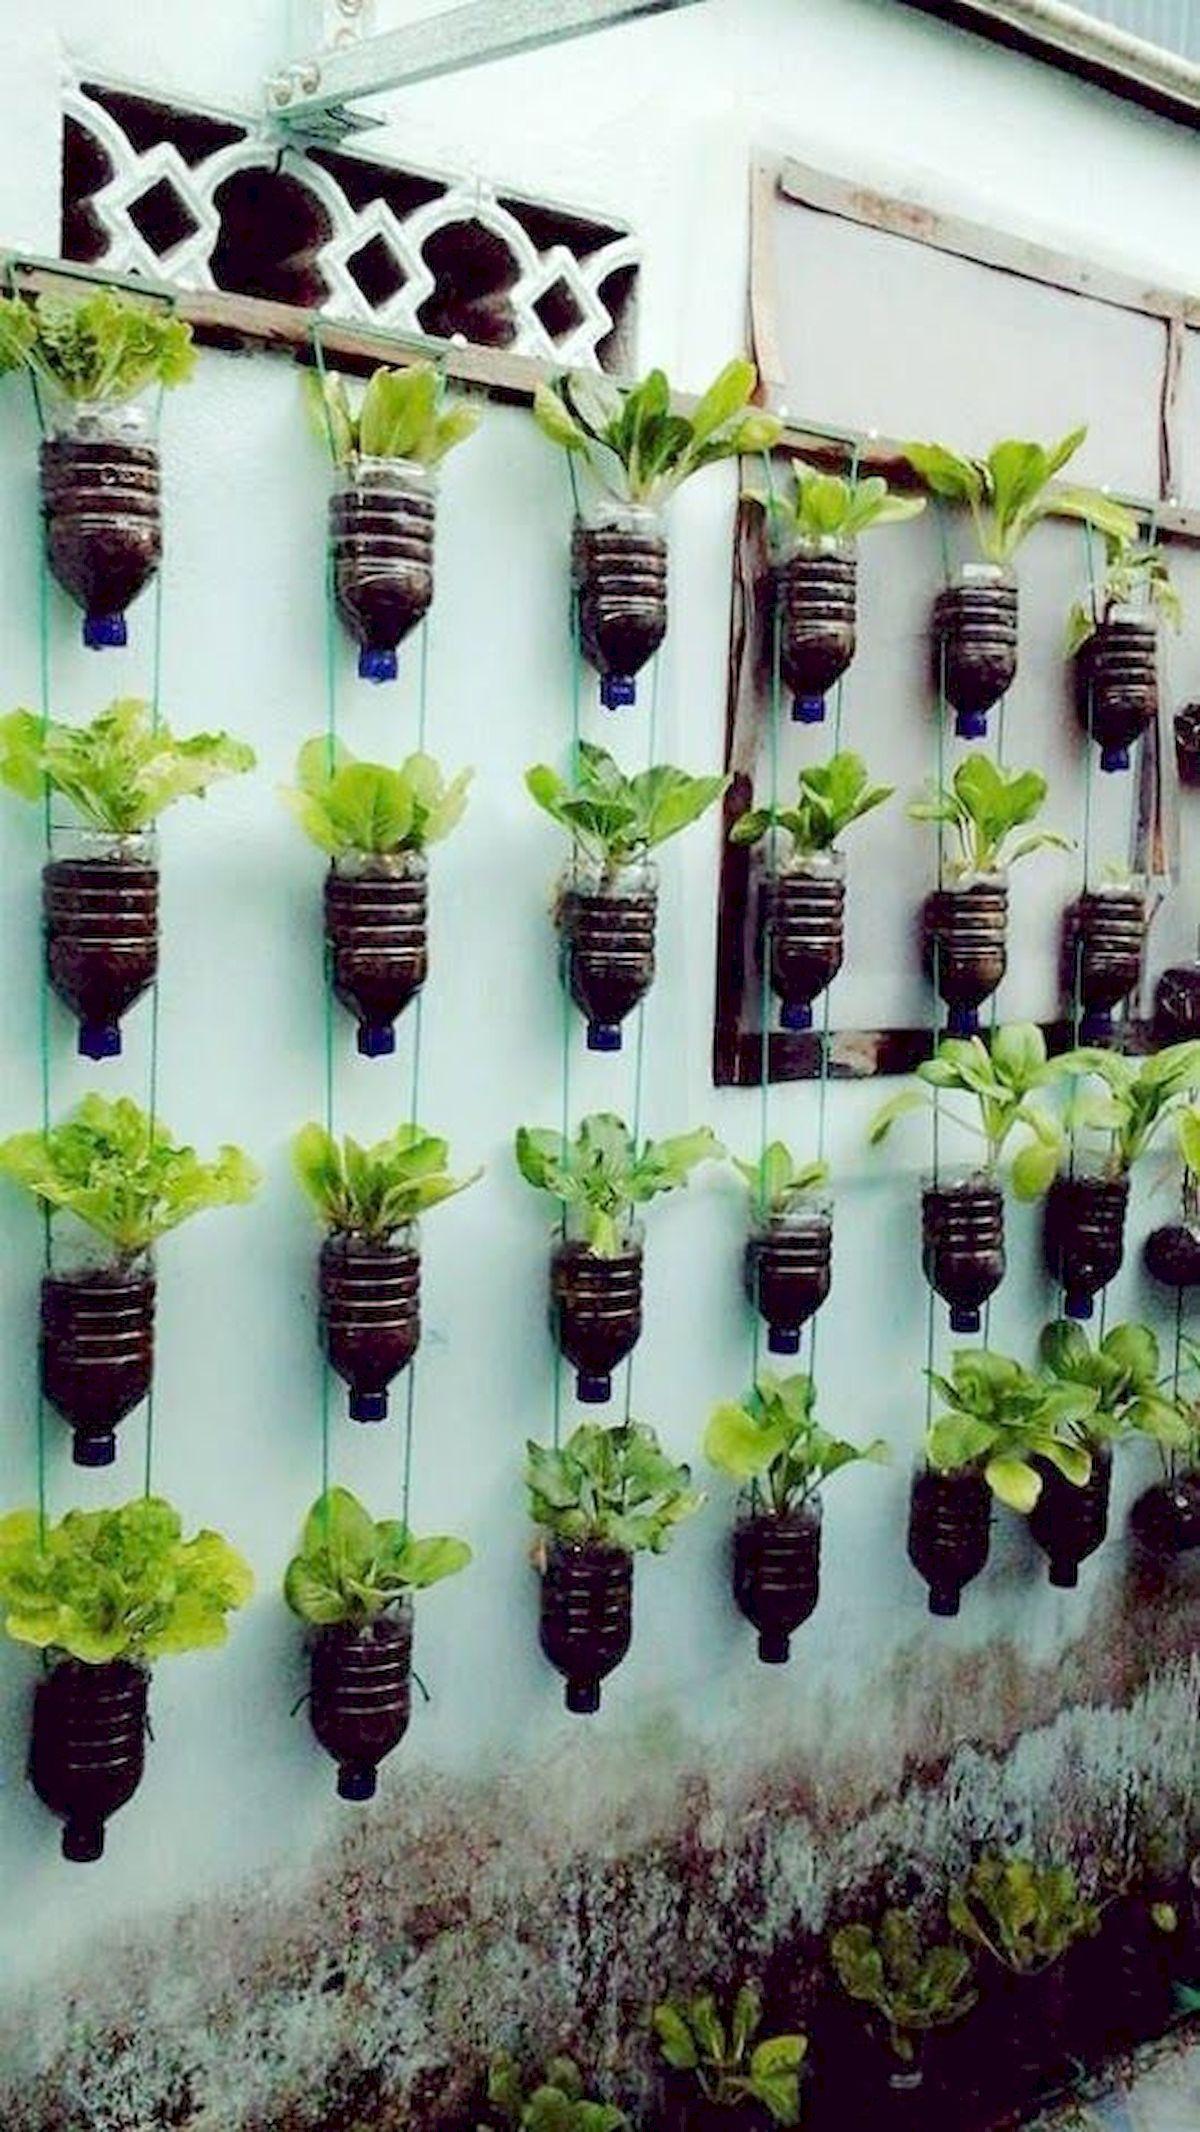 50 Amazing Vertical Garden Design Ideas And Remodel #gardendesignideas